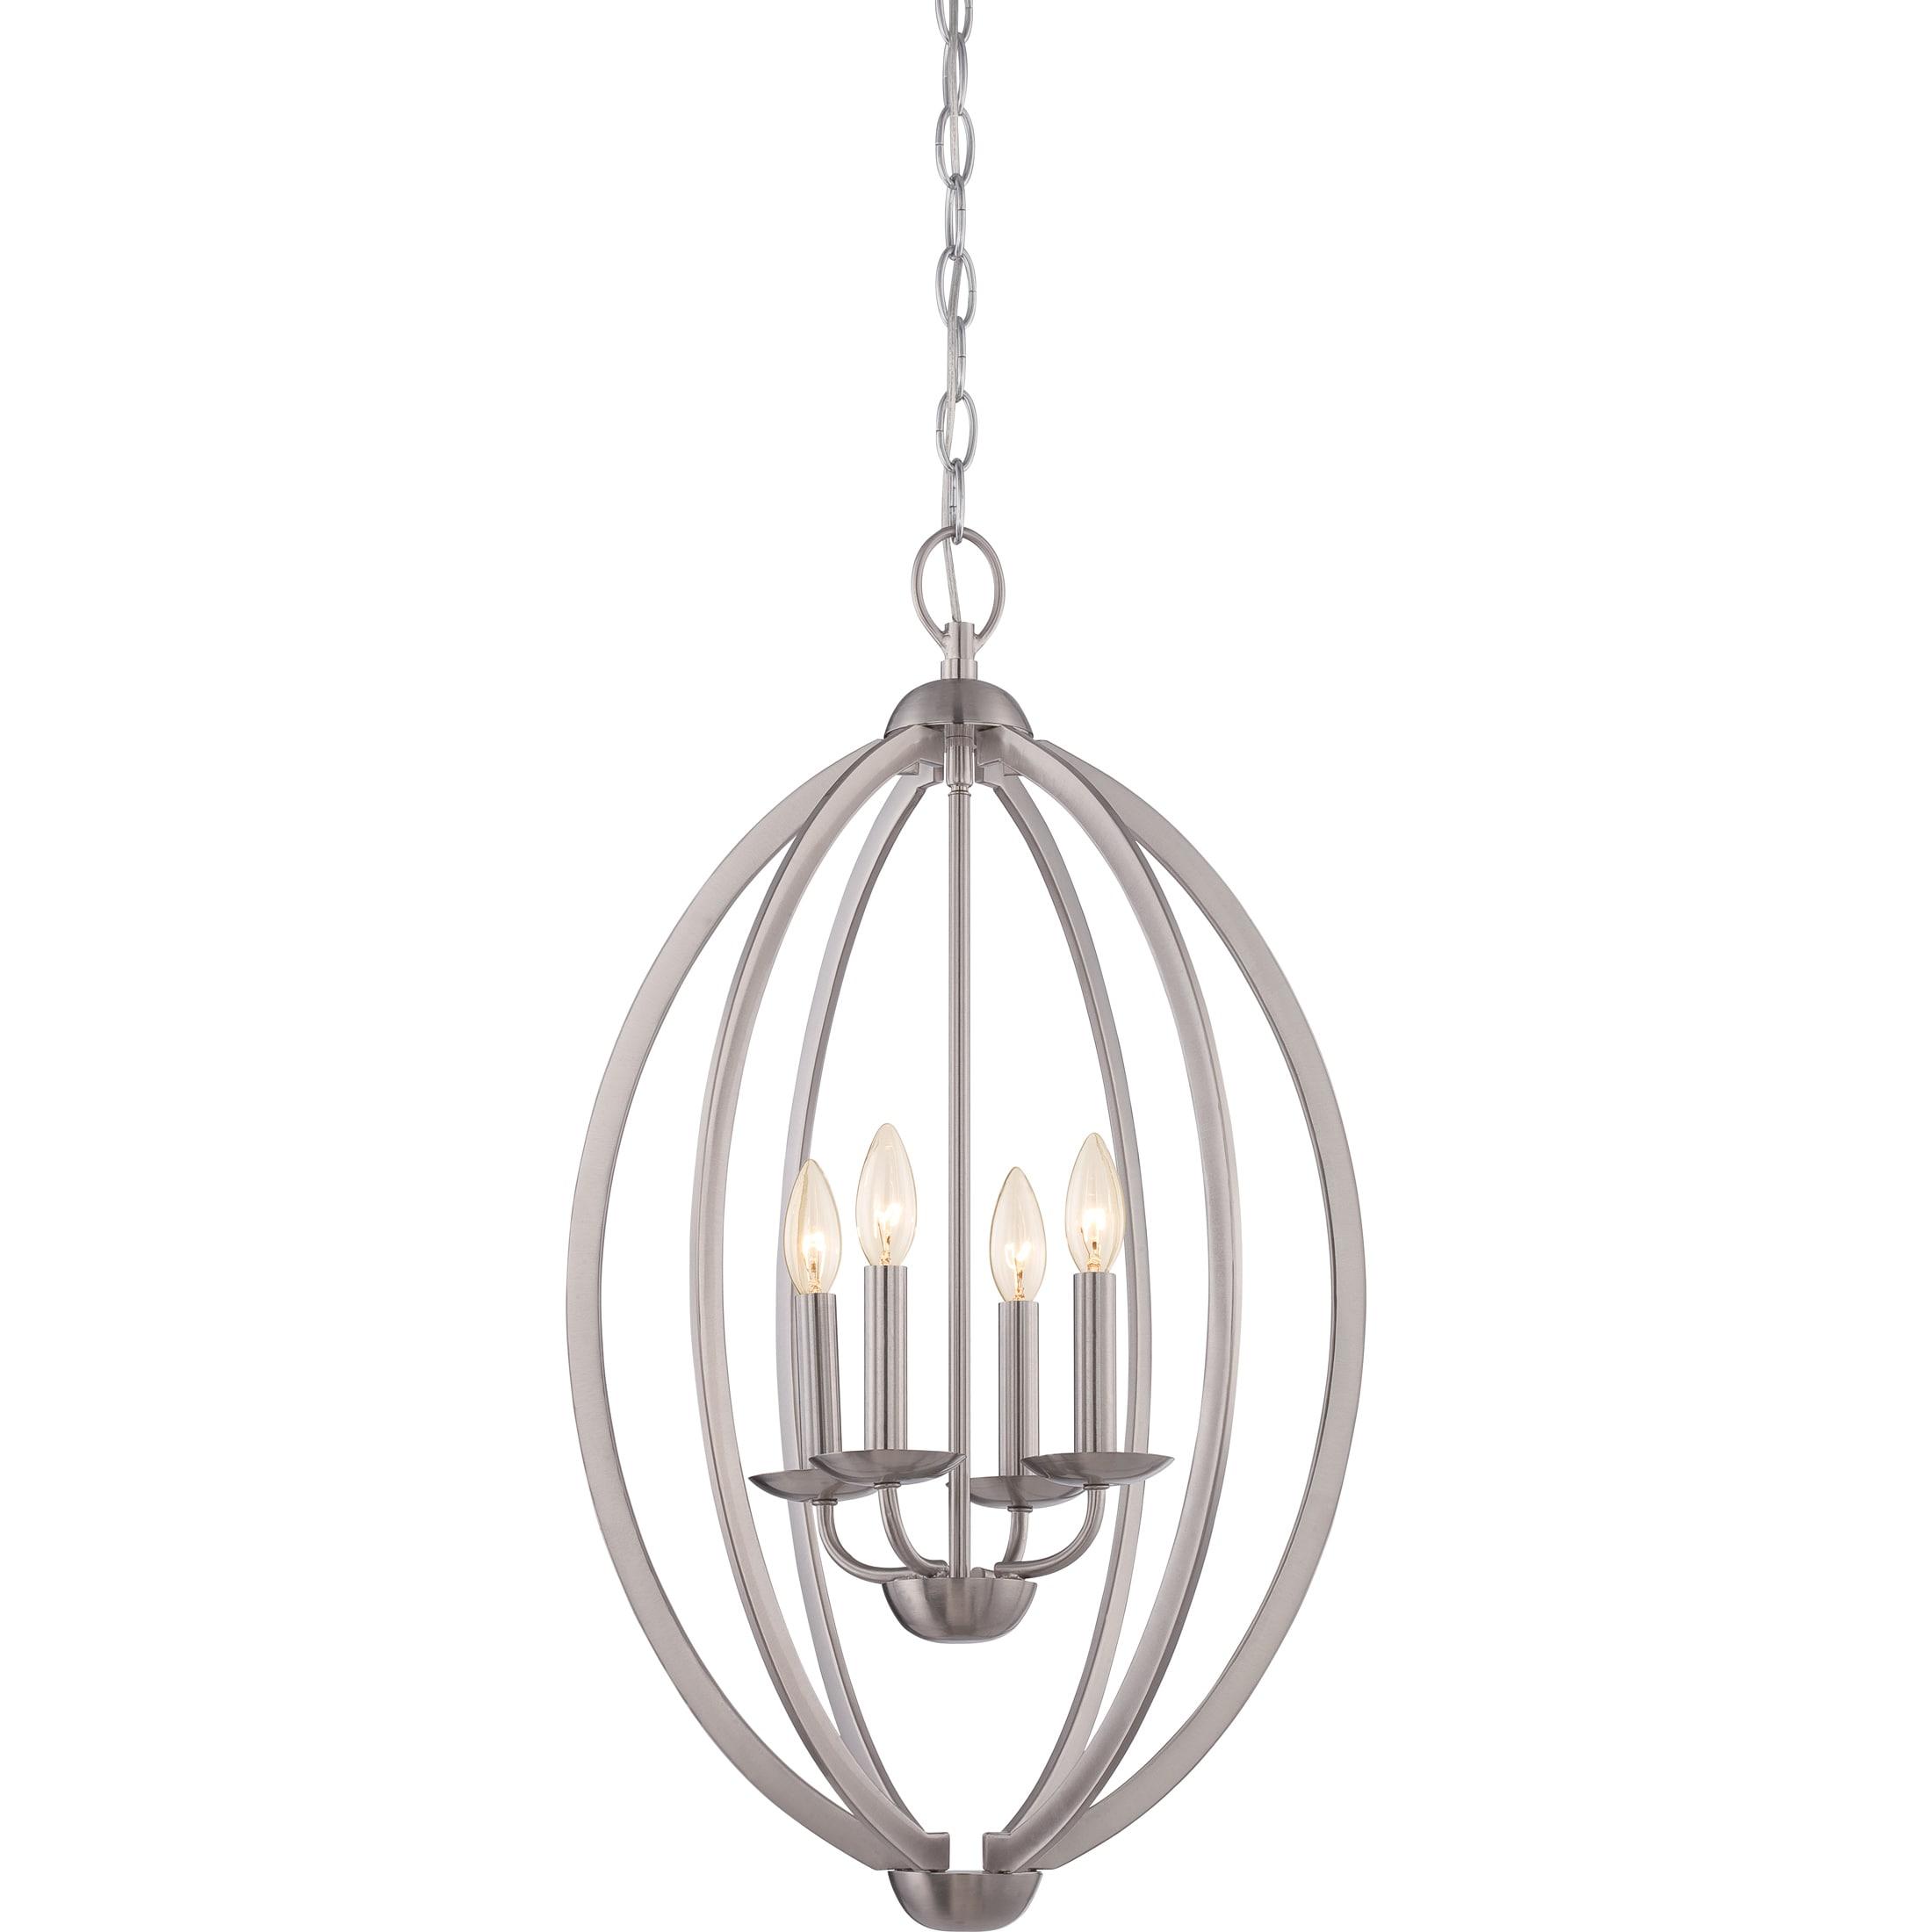 Shop Quoizel Fixture Revolution Brushed Nickel 4 Light Cage Chandelier Overstock 10041761